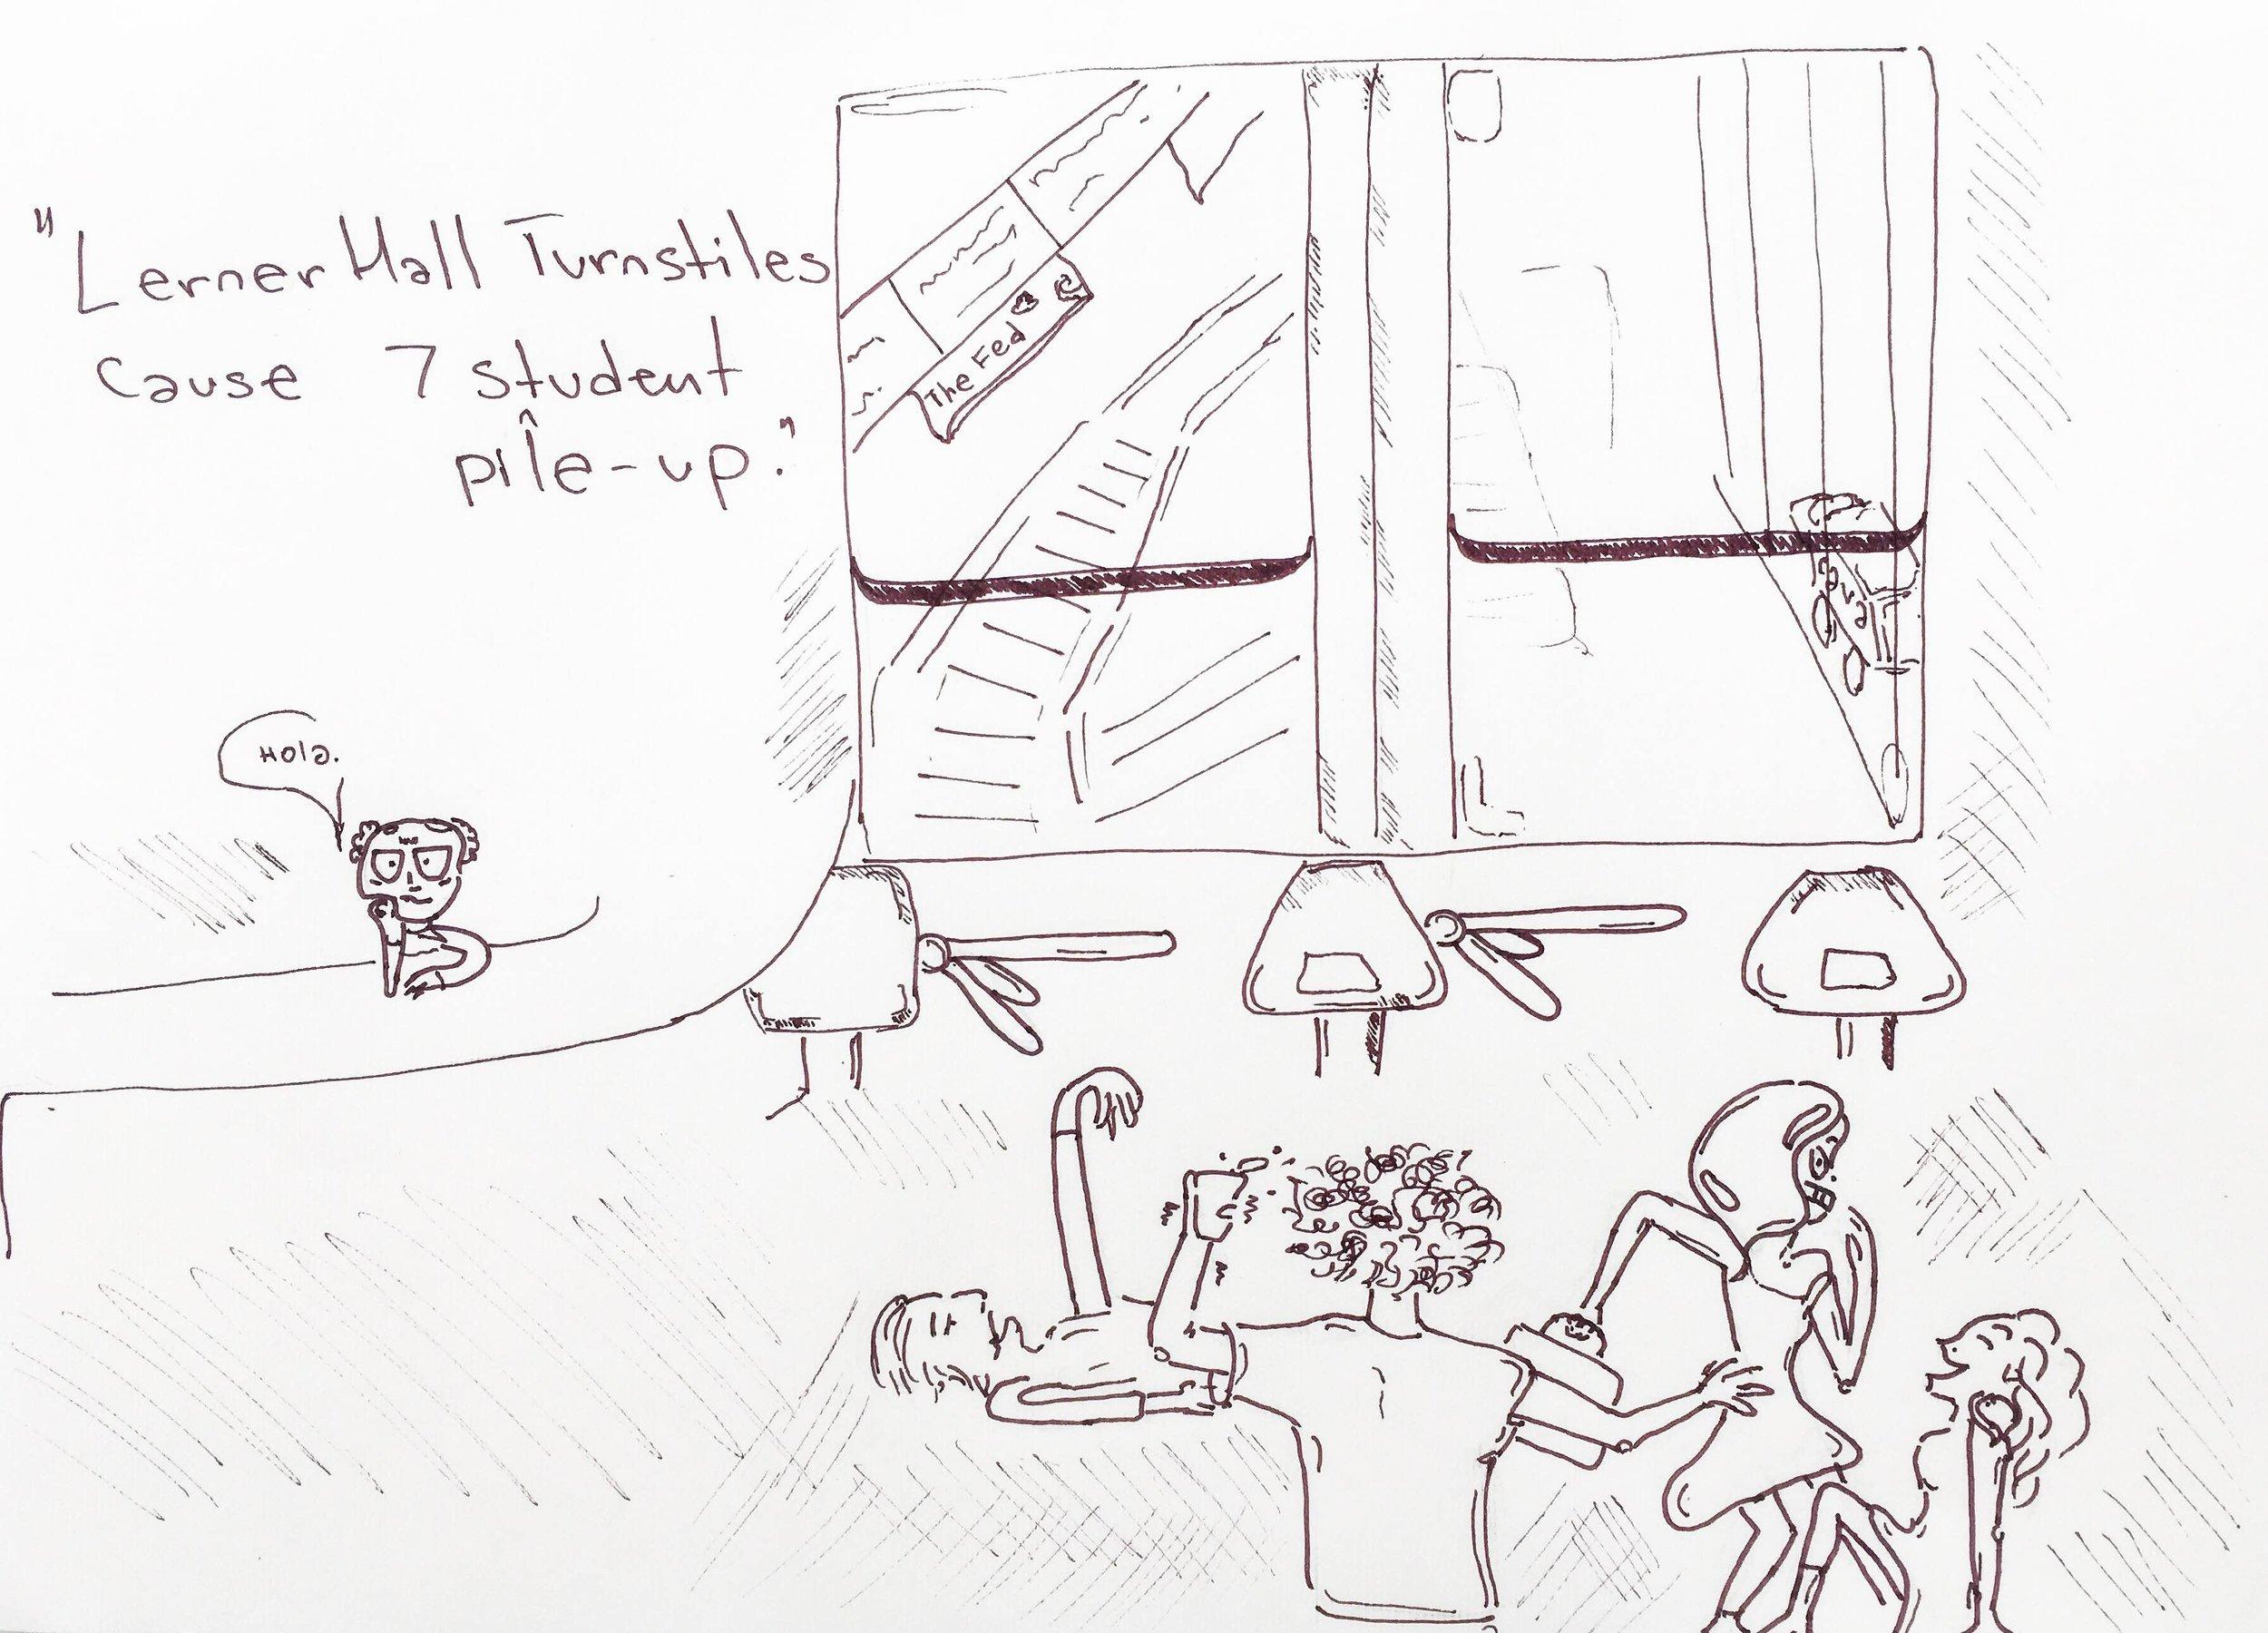 An artist's rendering of the scene